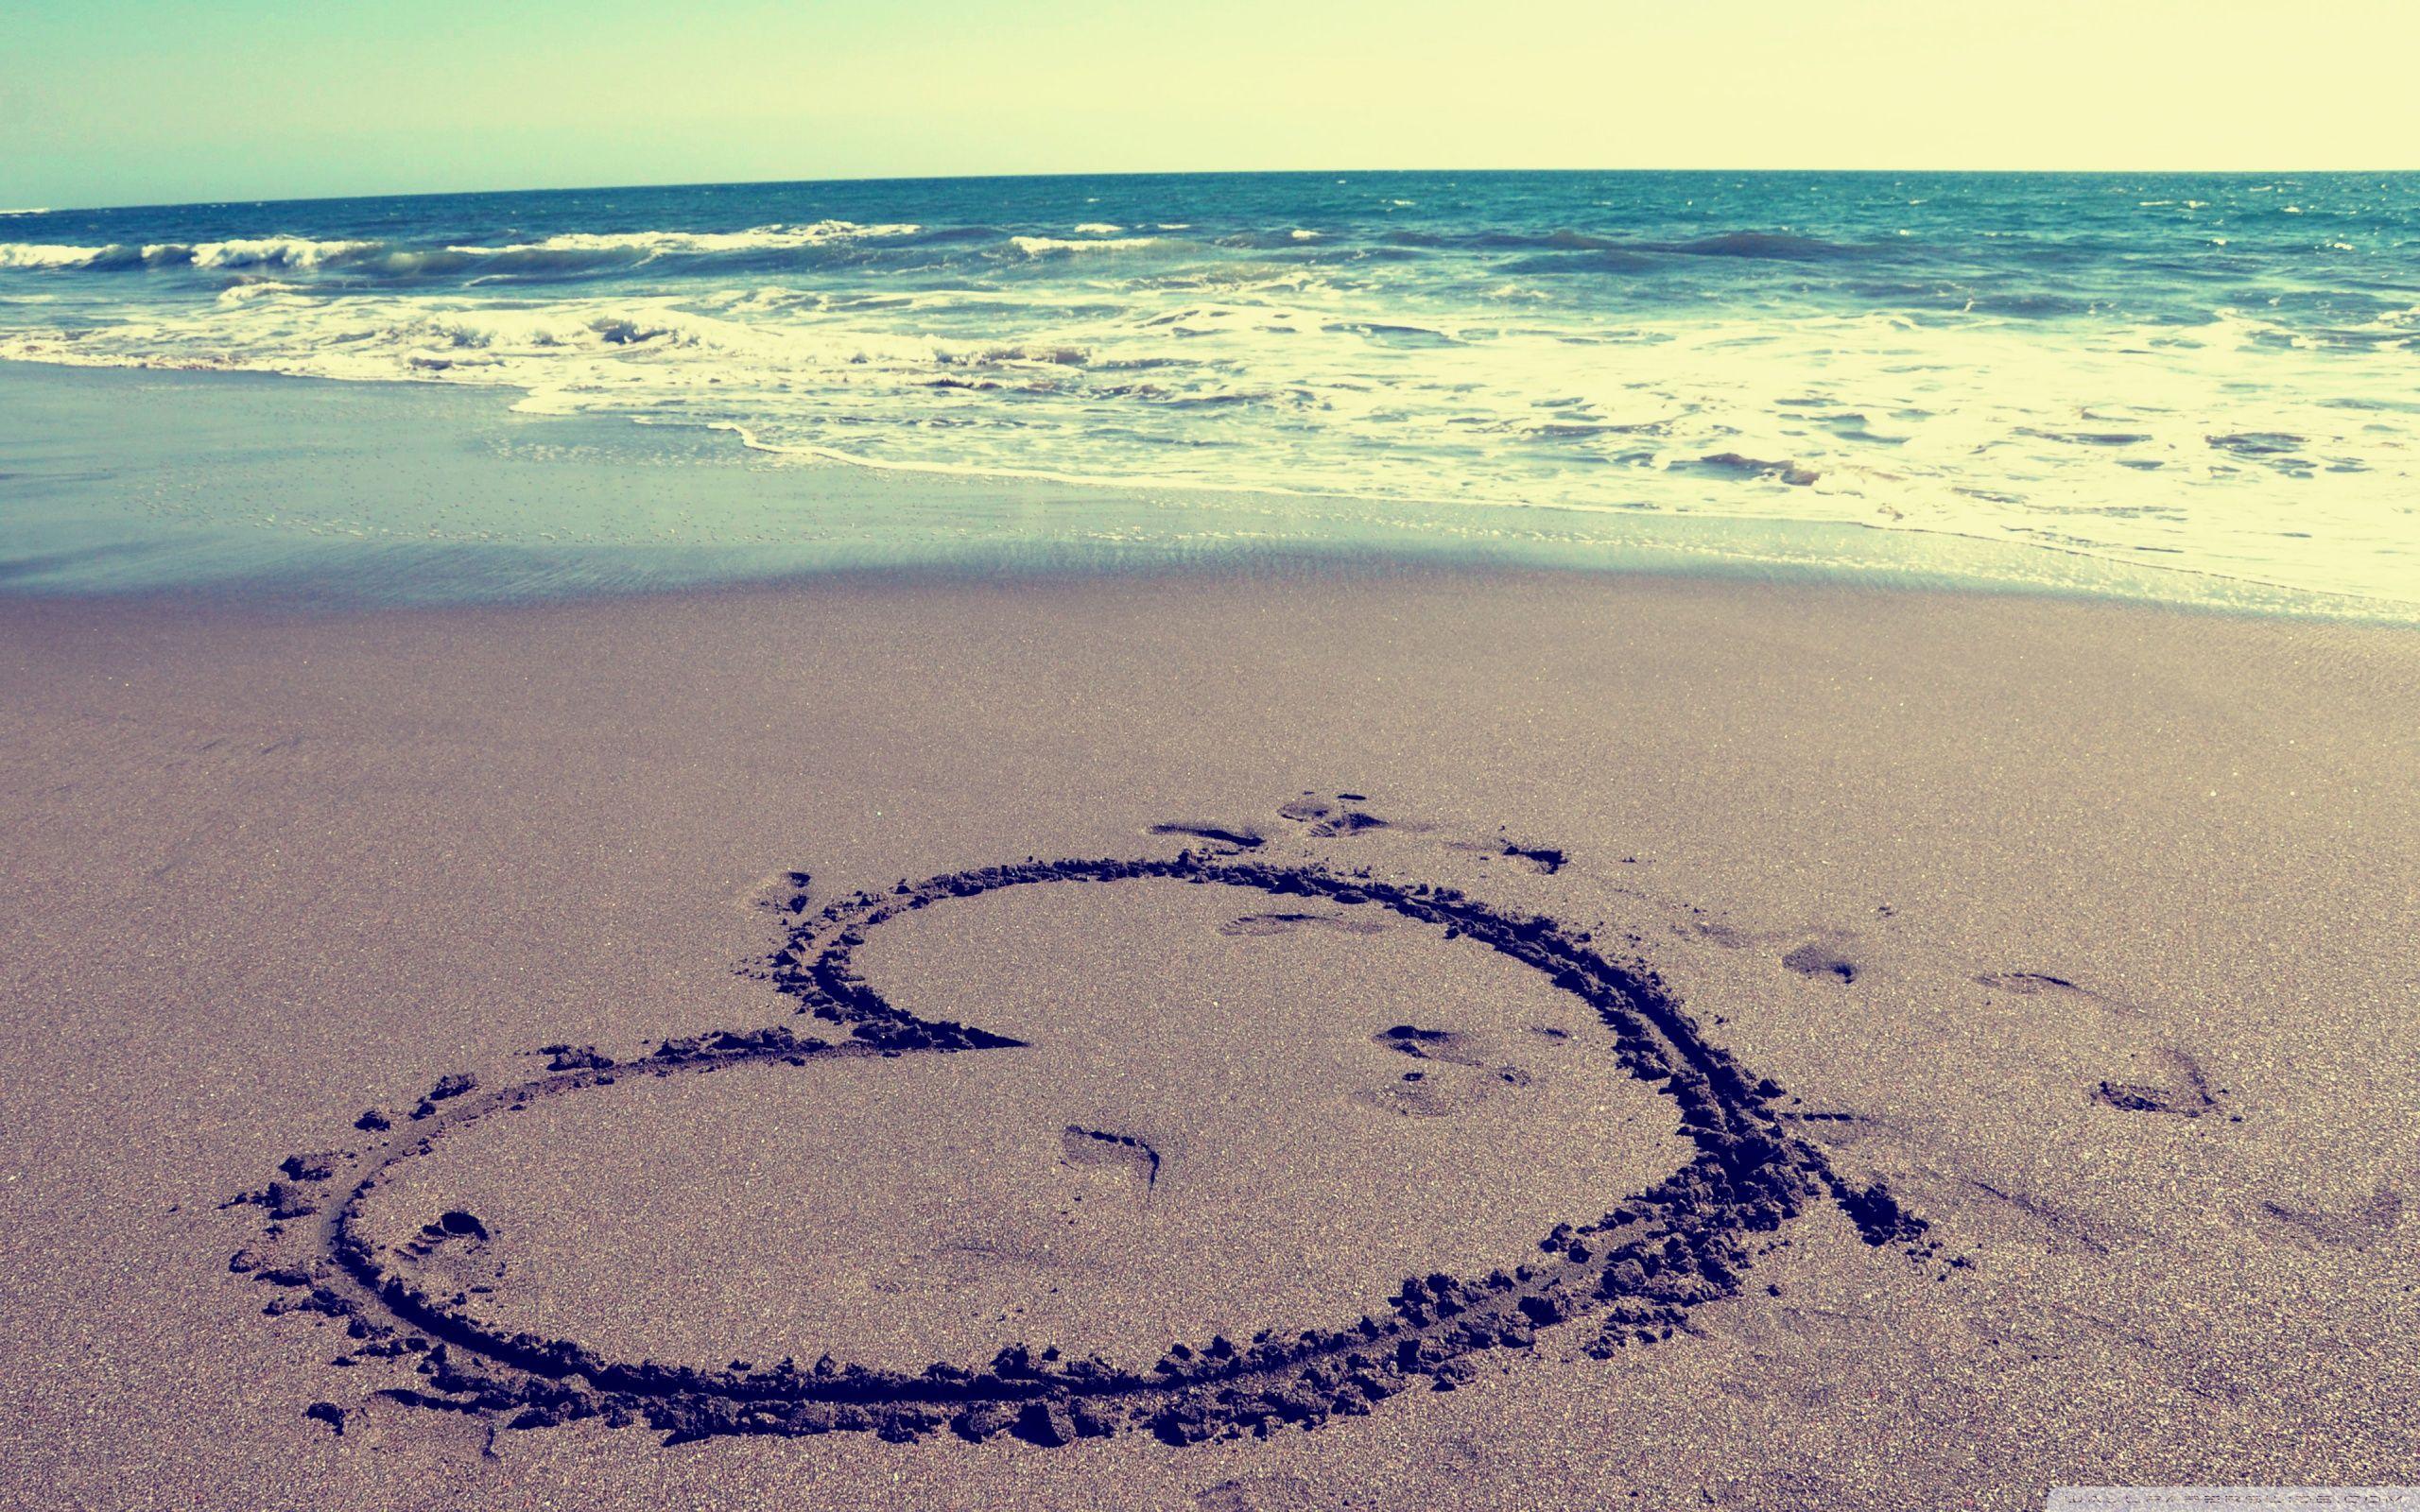 Heart On Beach ❤ 4k Hd Desktop Wallpaper For 4k Ultra - Cute Pictures Of The Beach - HD Wallpaper